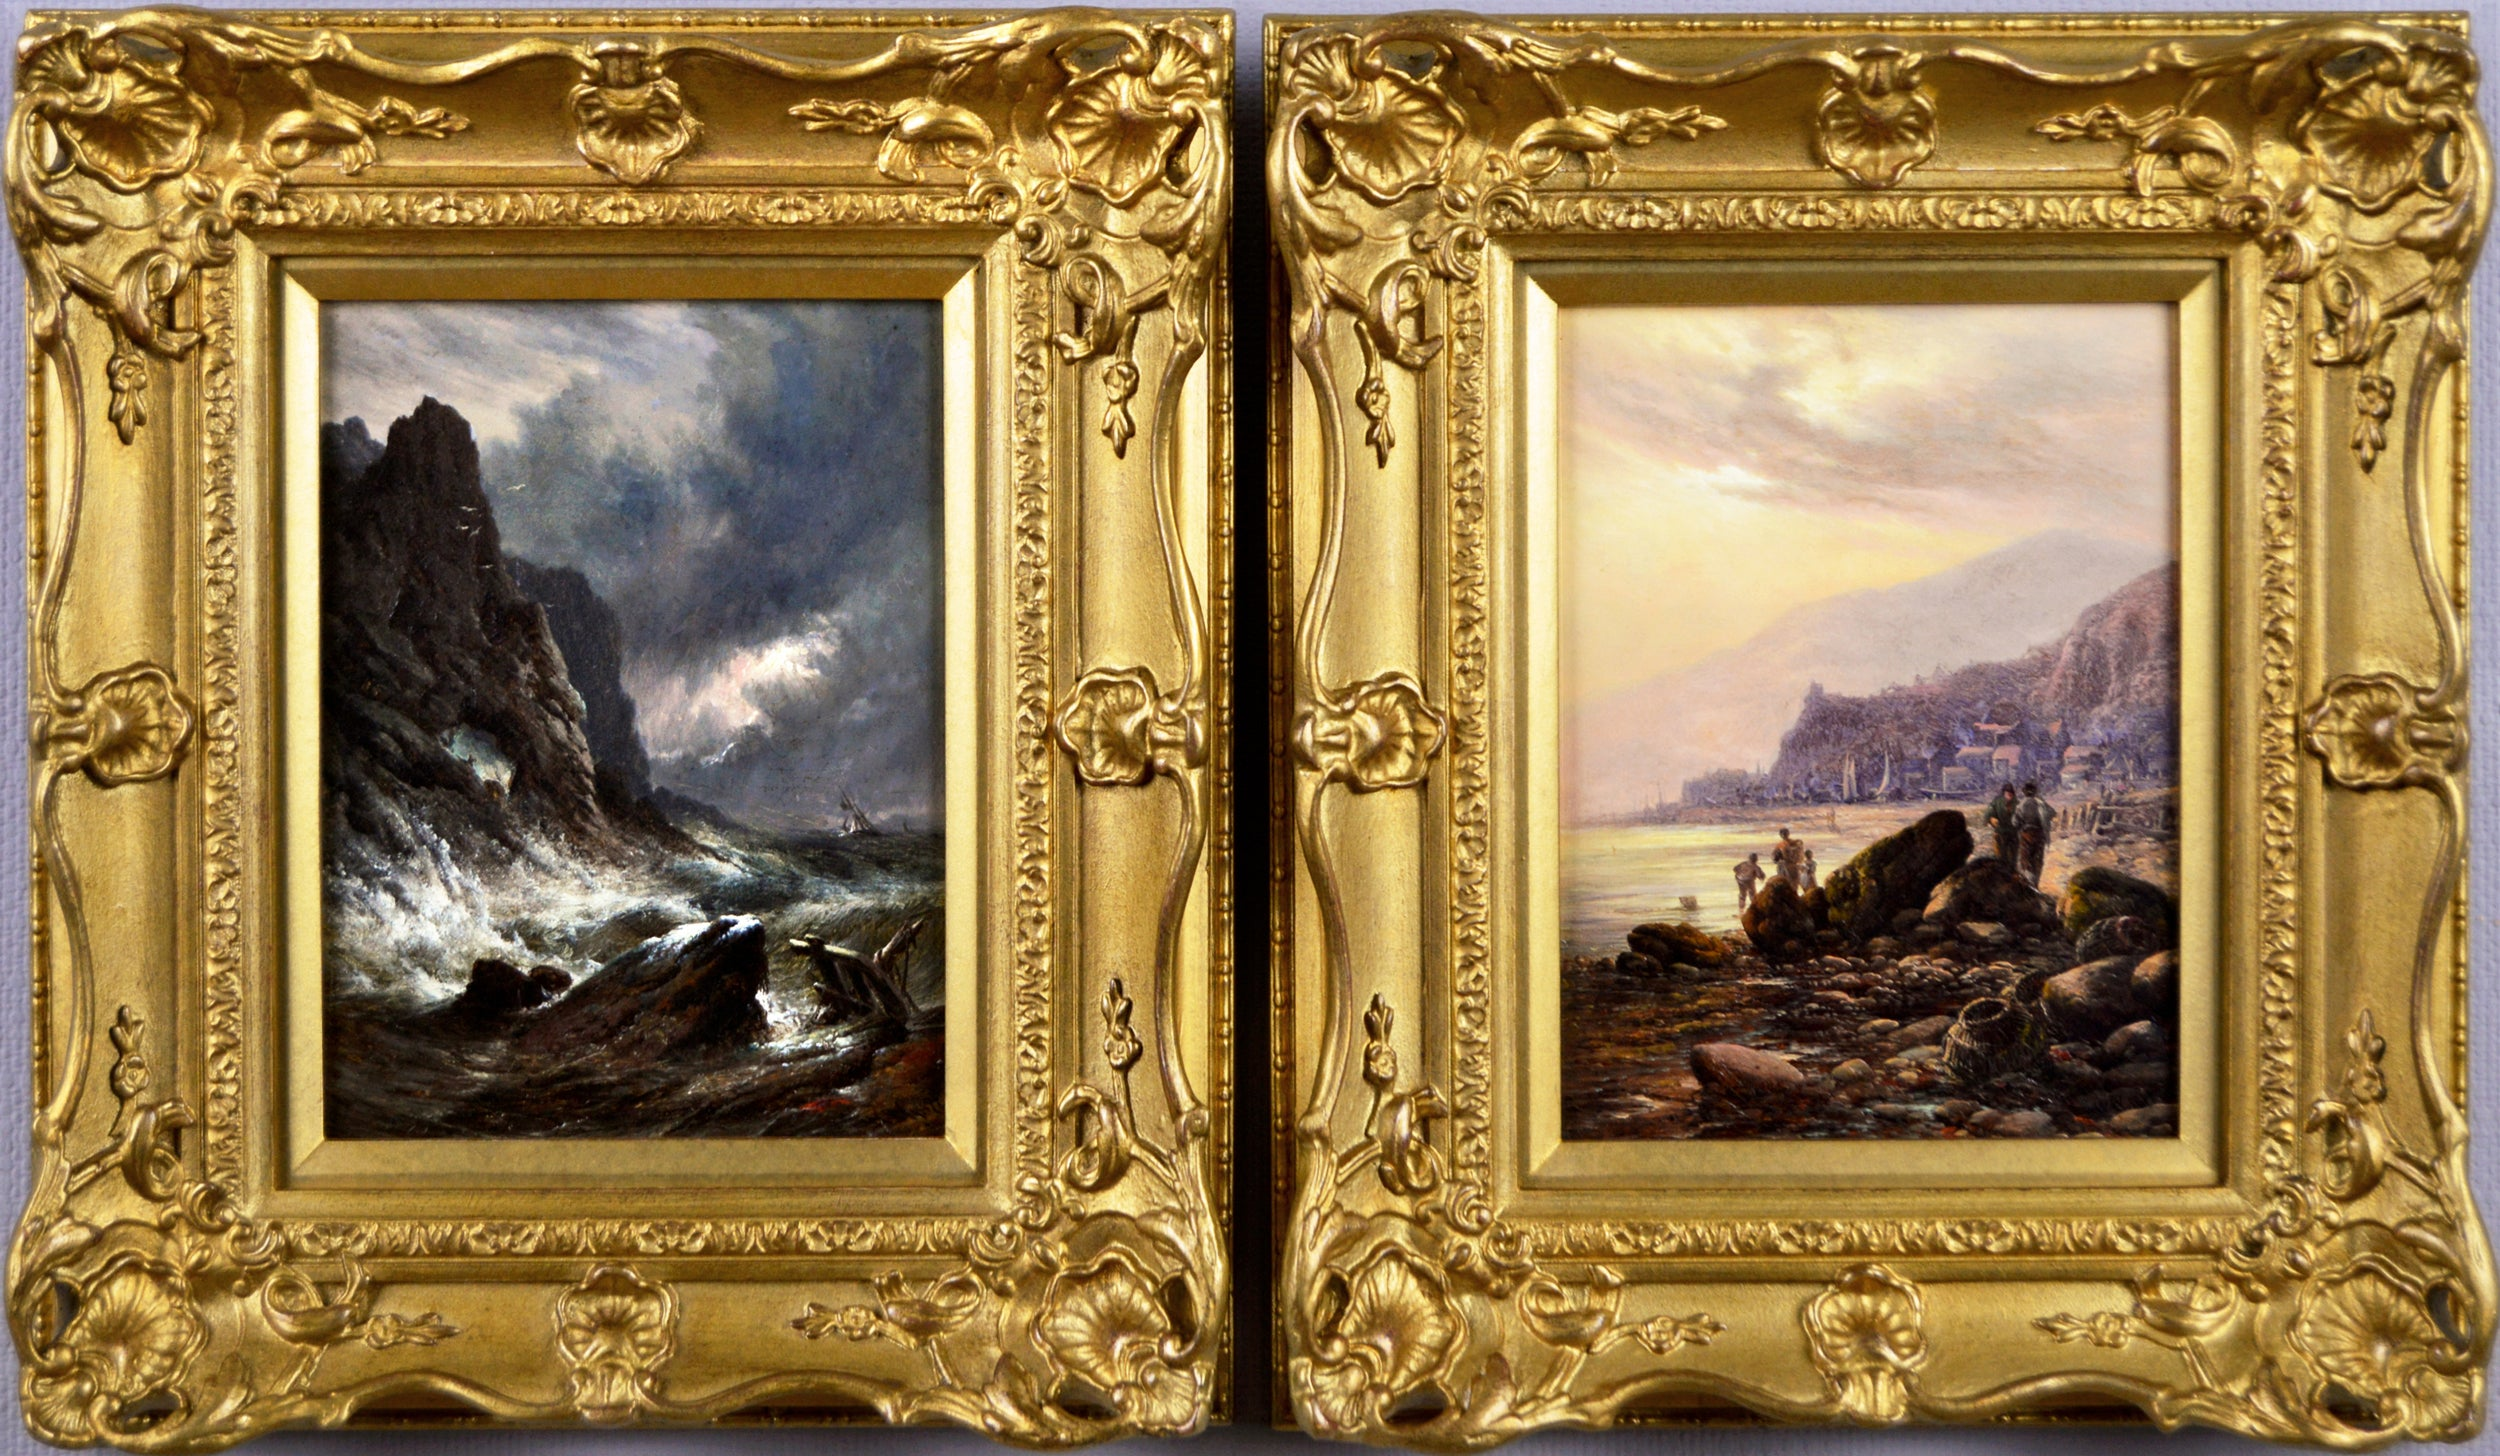 Pair of 19th Century coastal seascape oil paintings